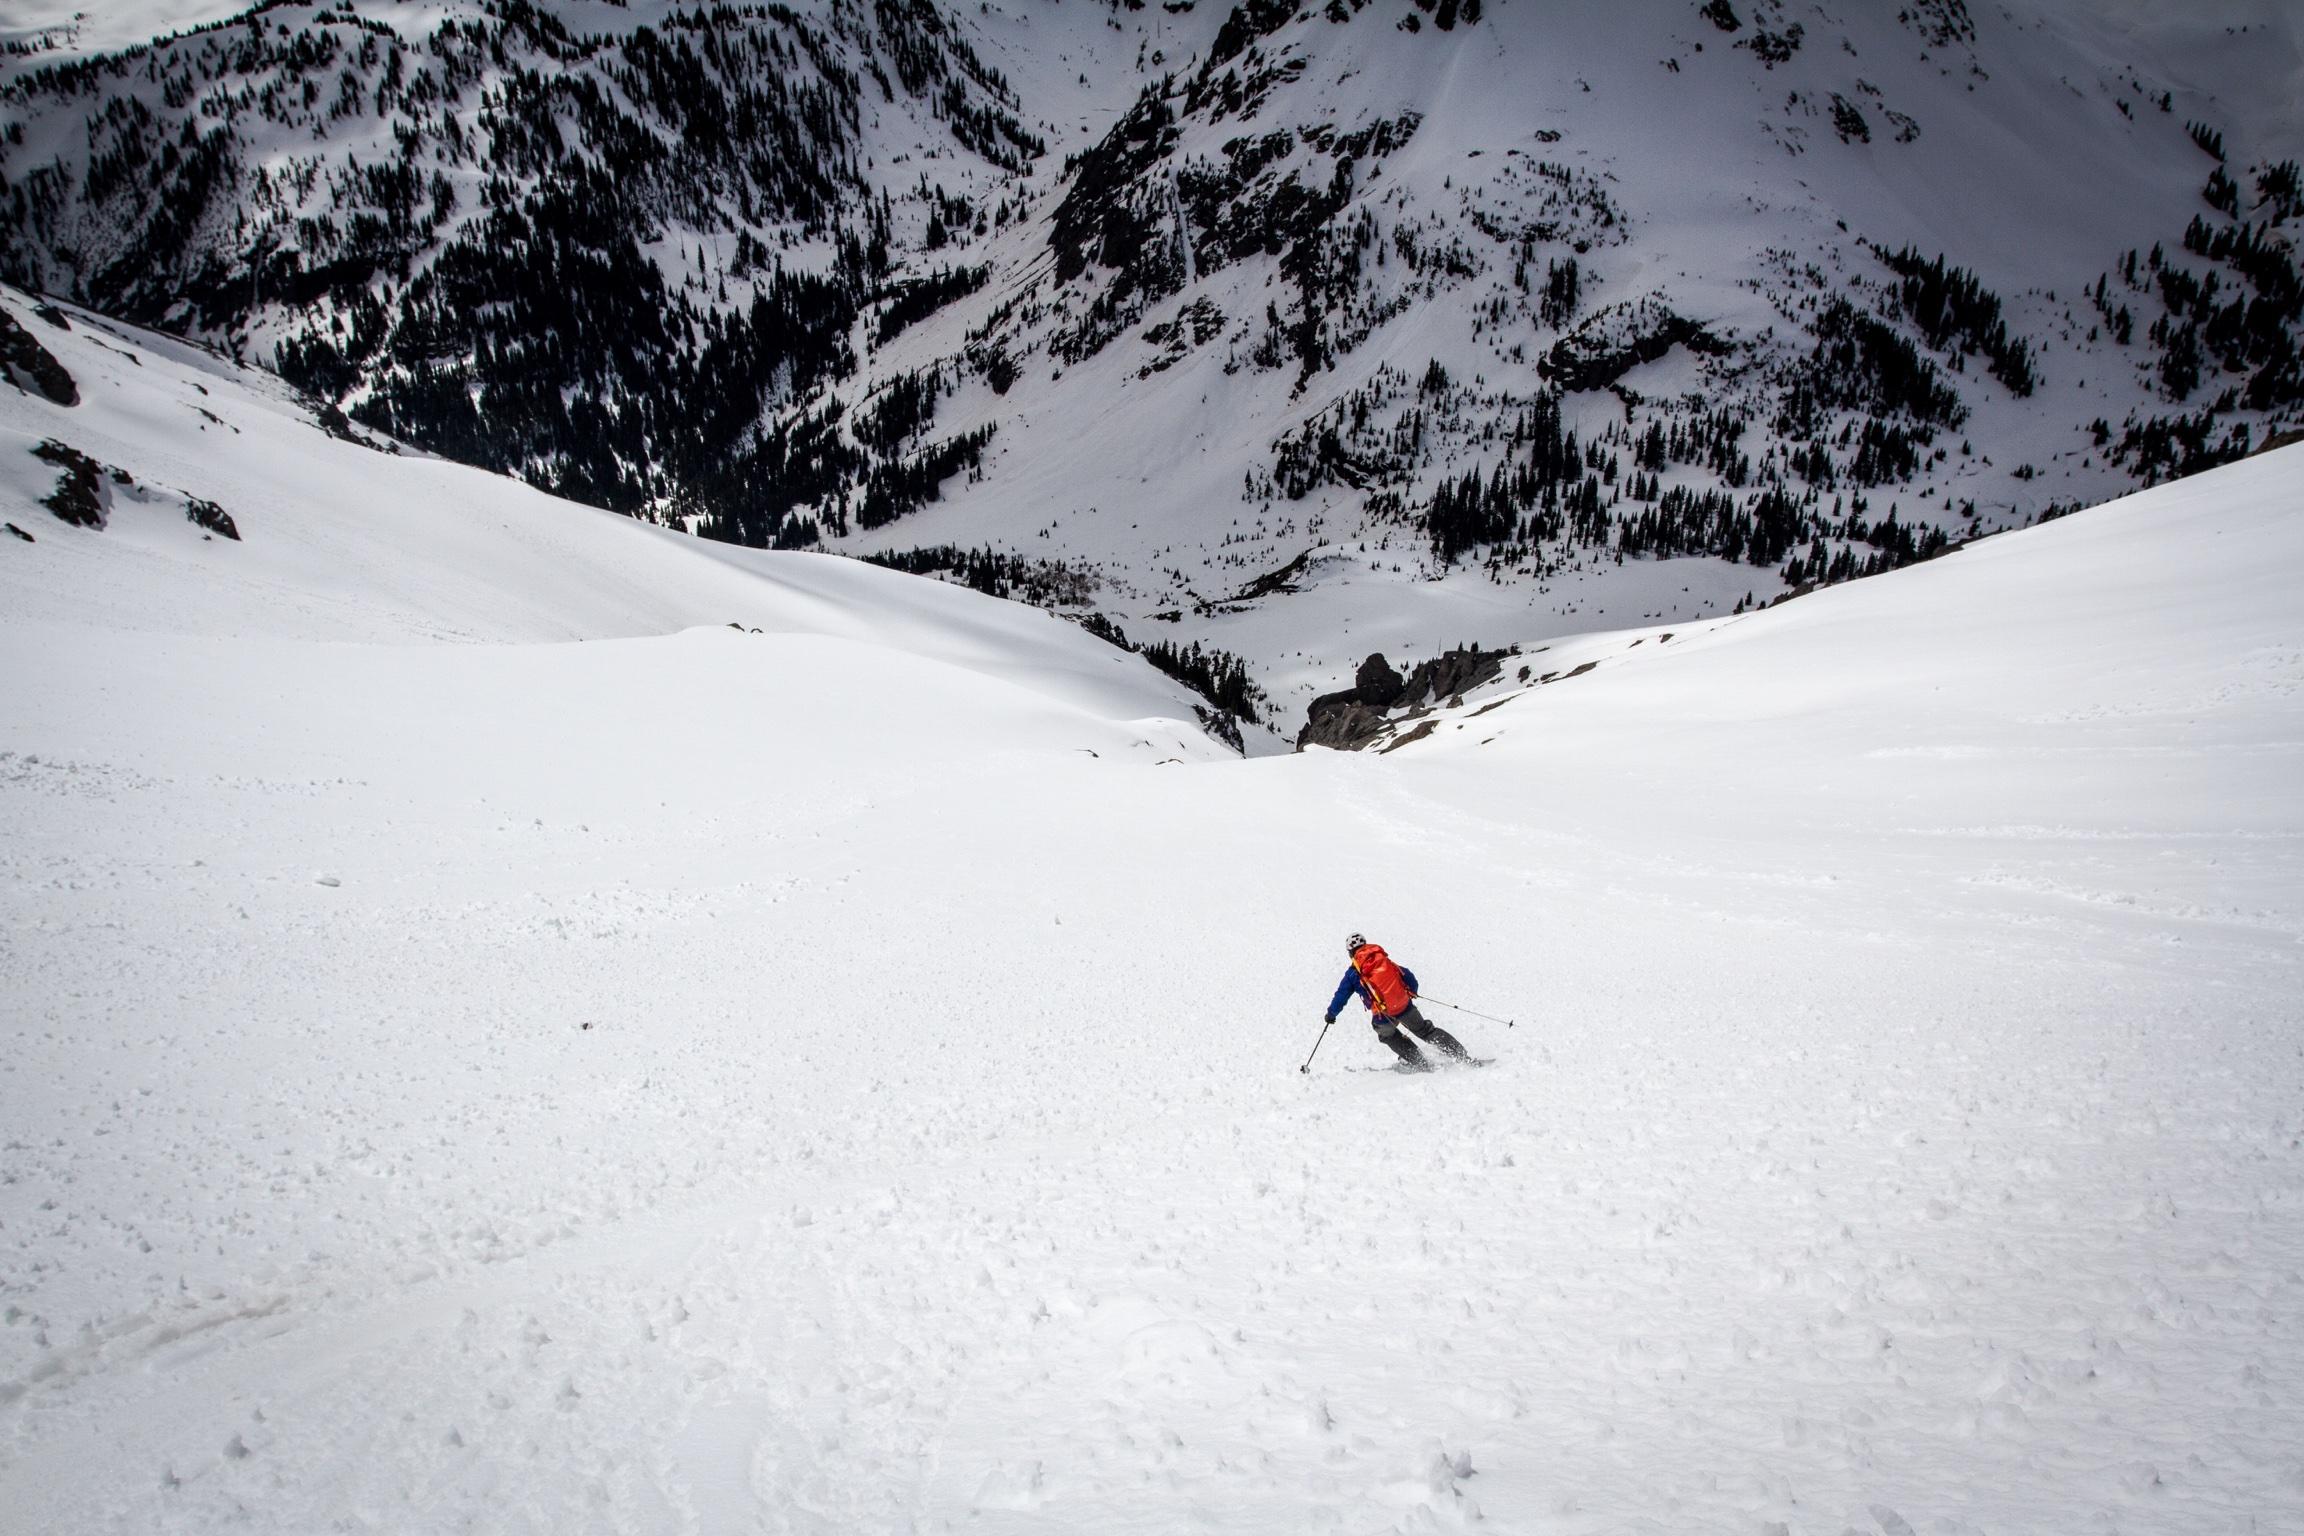 Skiing back into Yankee Boy Basin. Photo: TJ David